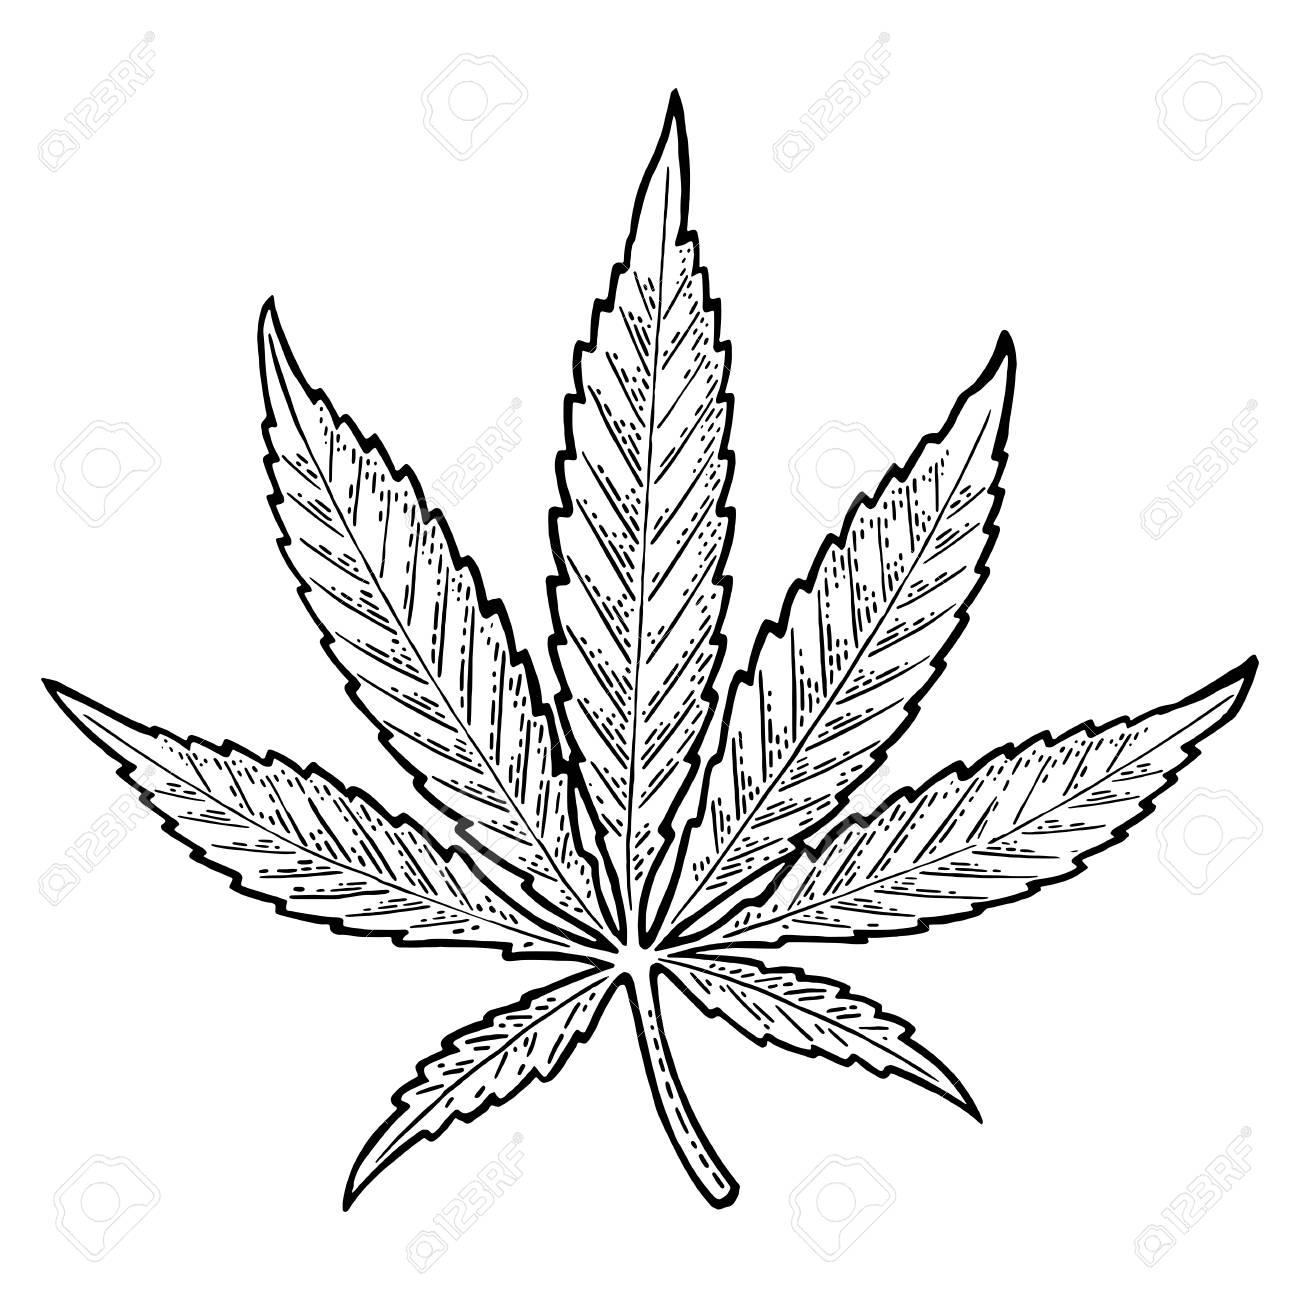 Marijuana leaf. Vintage black vector engraving illustration - 88032432